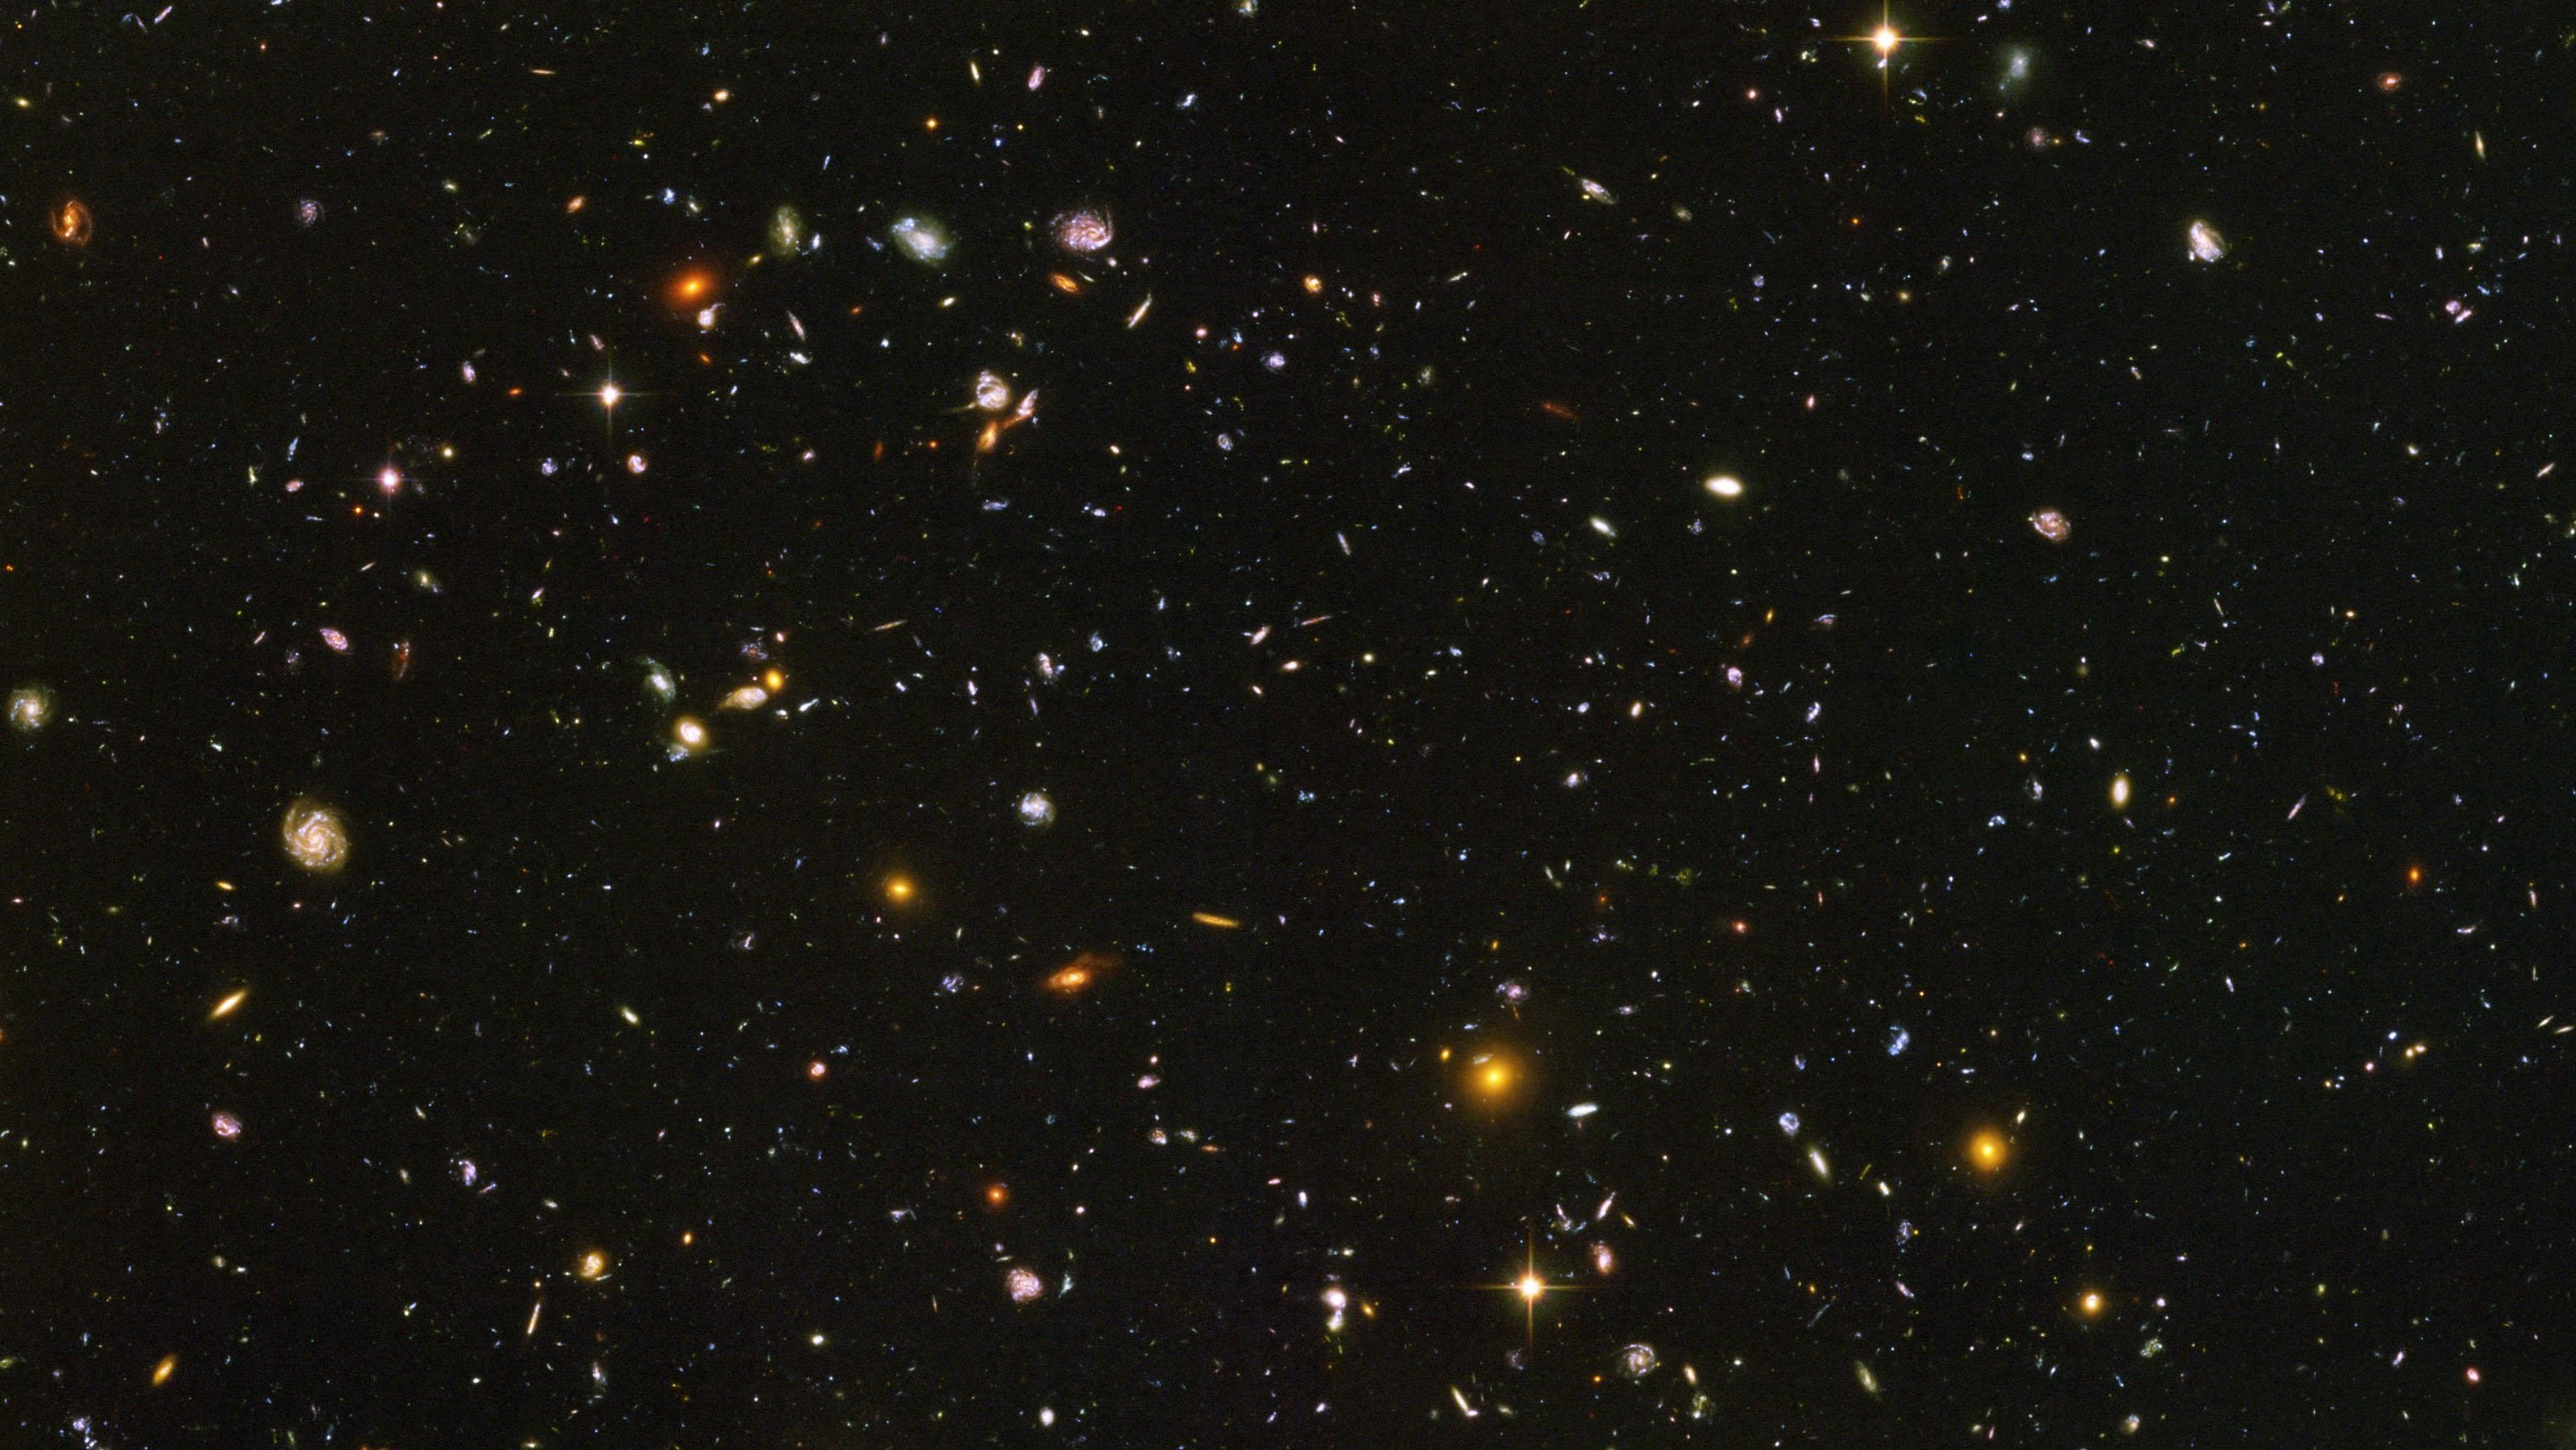 Hd Wallpapers Hubble Ultra Deep Field 1602 X 1200 1181 Kb Jpeg .